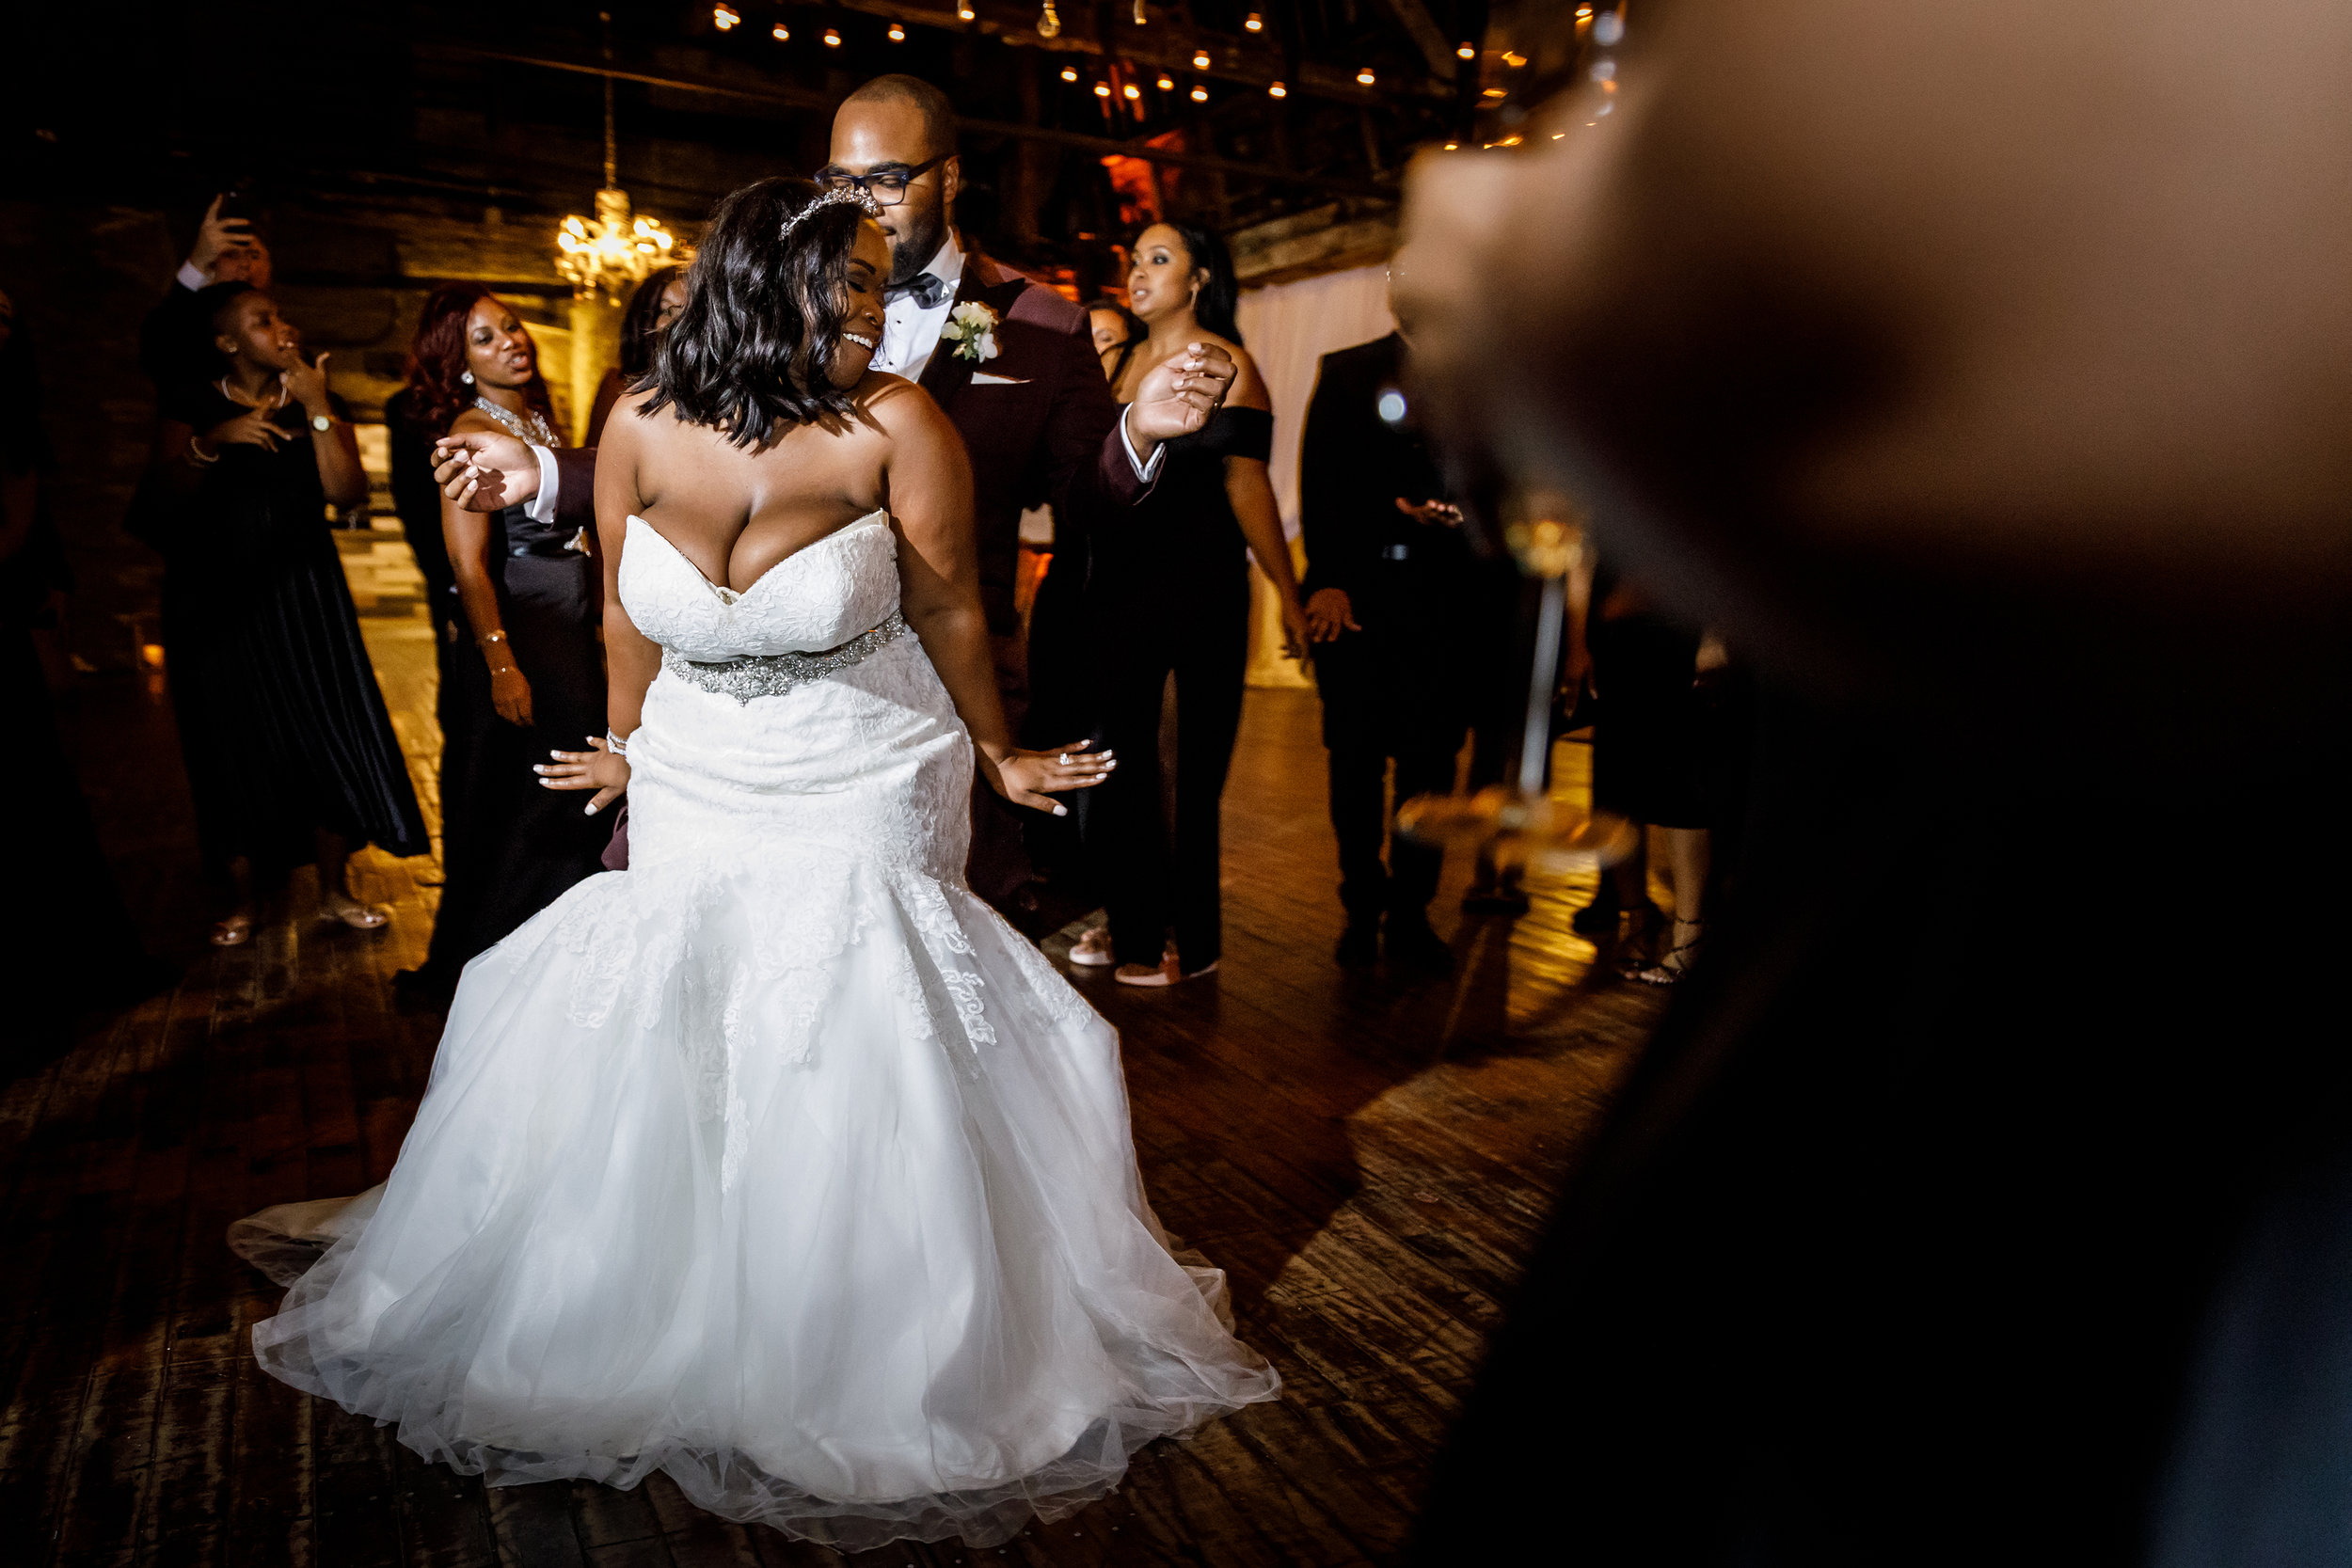 victorious-events-nyc-047-yanique-rondel-greenpoint-loft-wedding-amy-anaiz.jpg